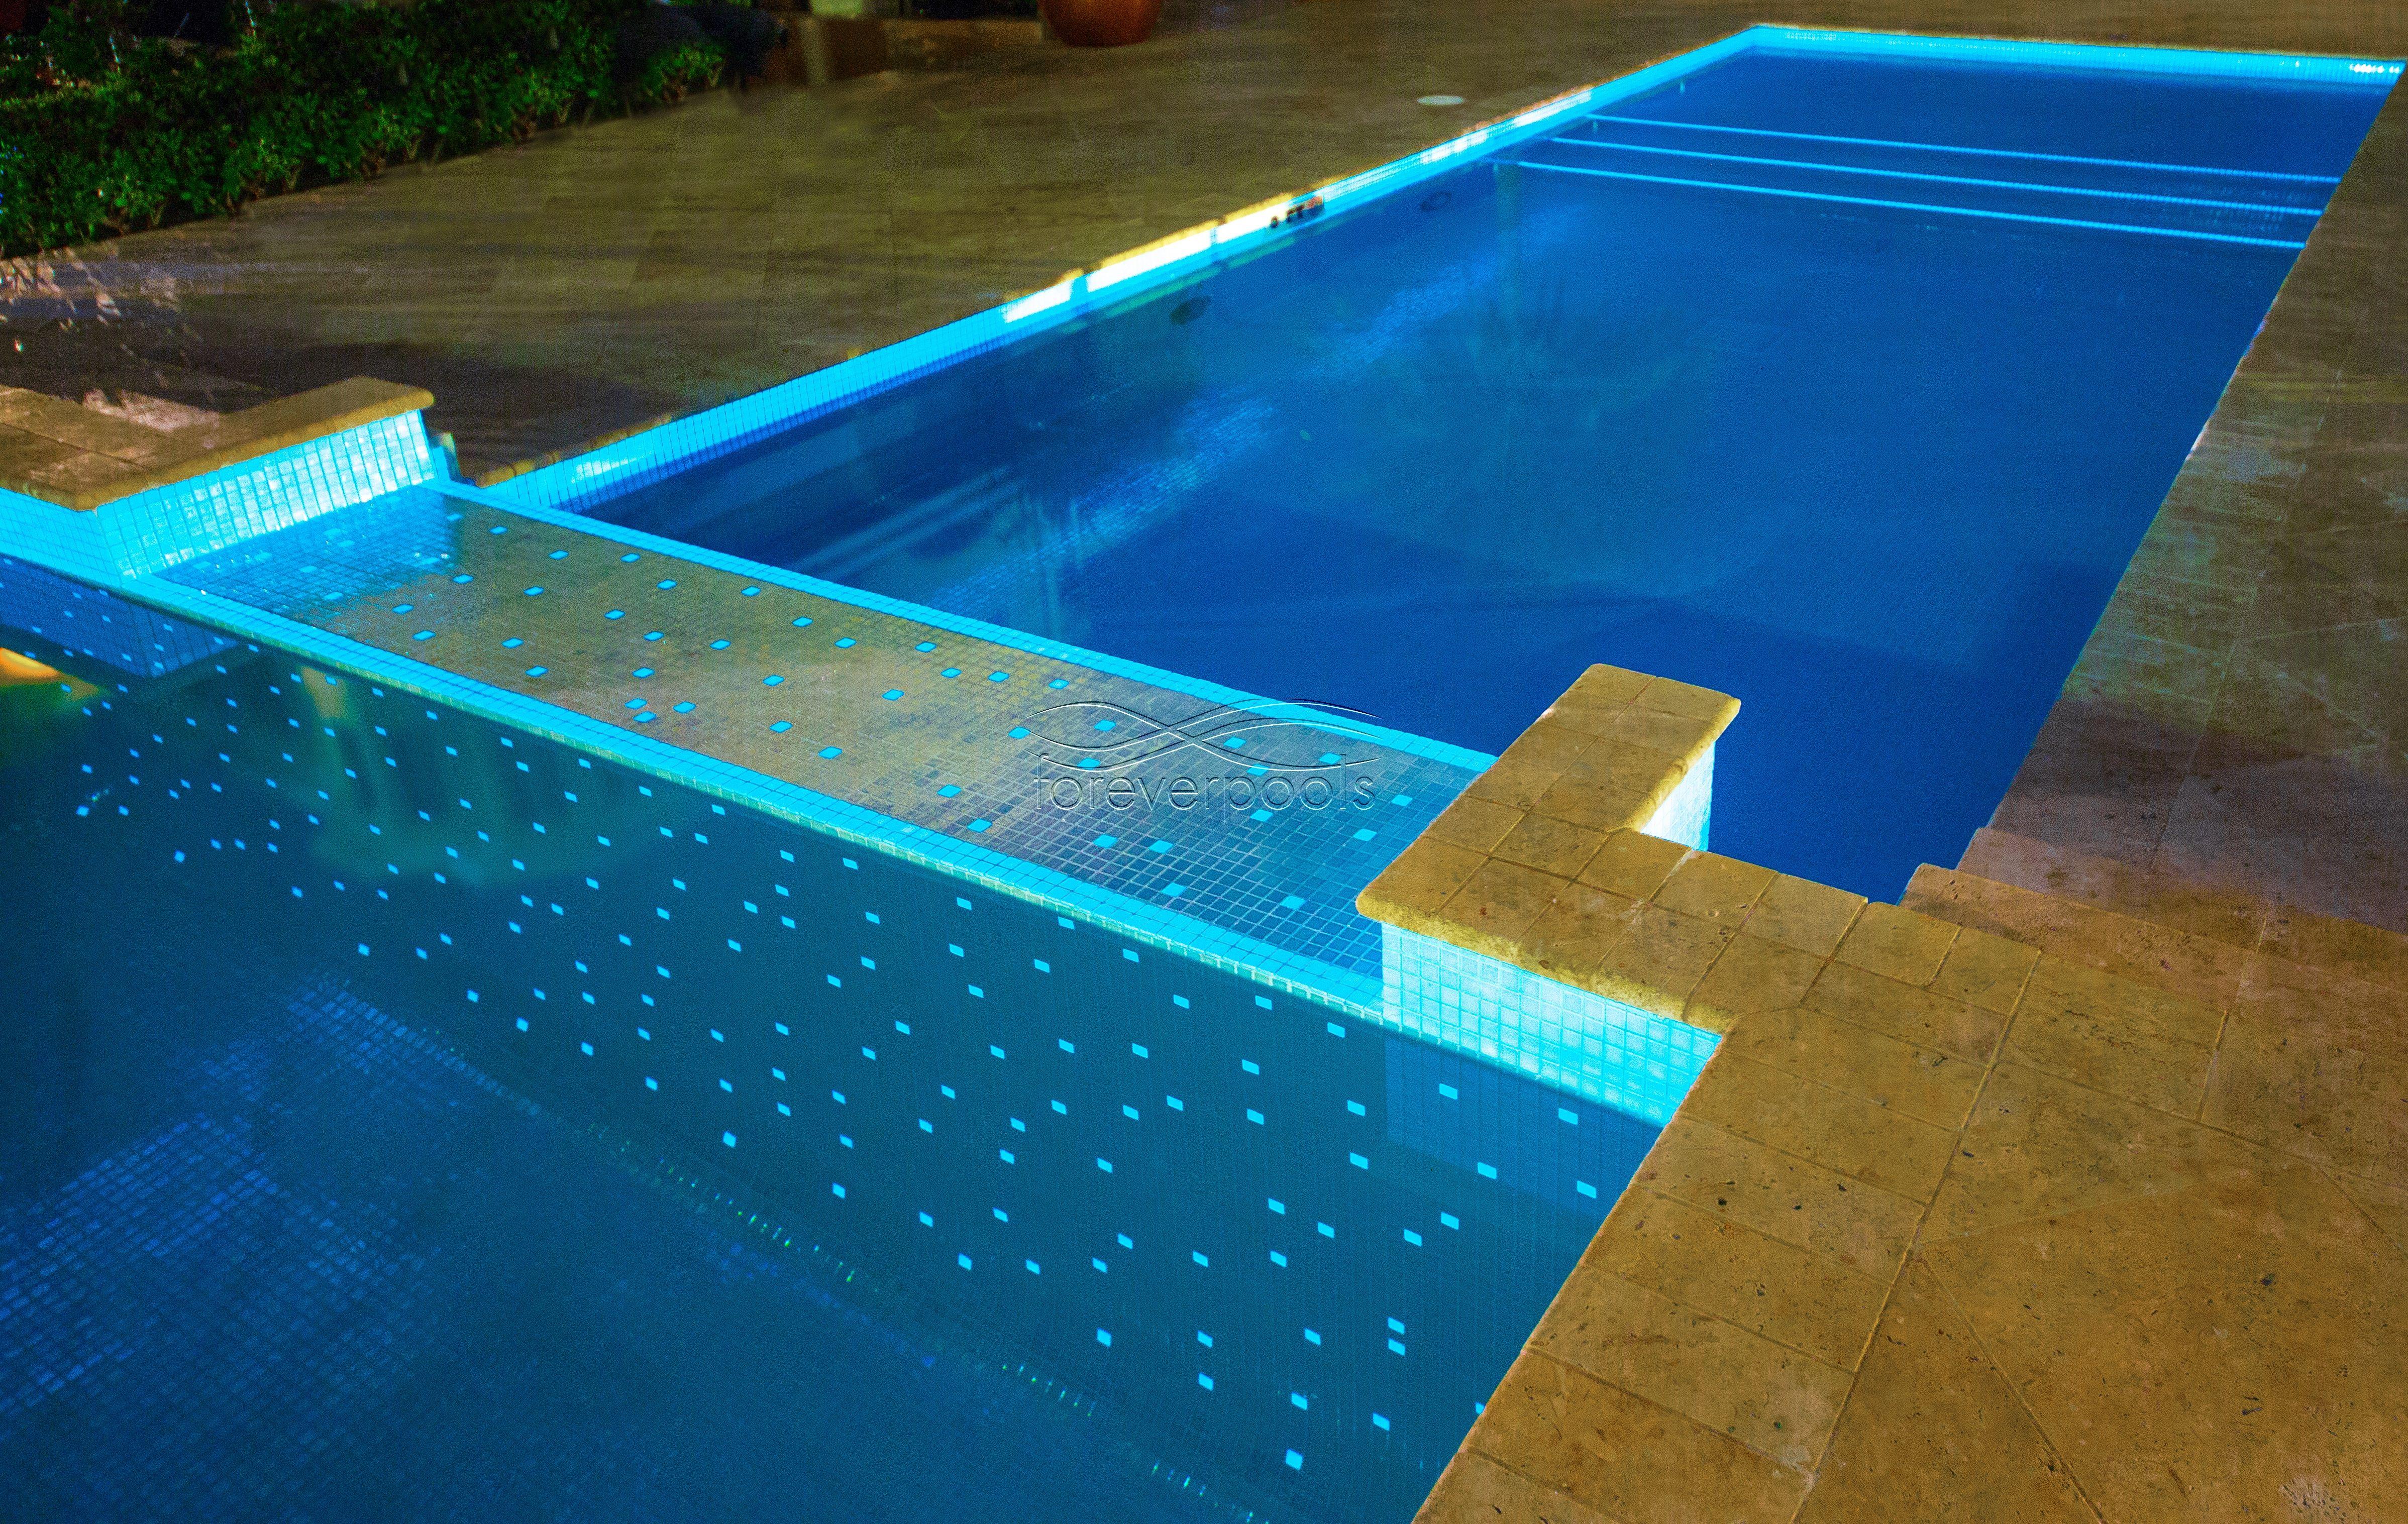 Glow In The Dark Swimming Pool Tiles Pool Tile Swimming Pool